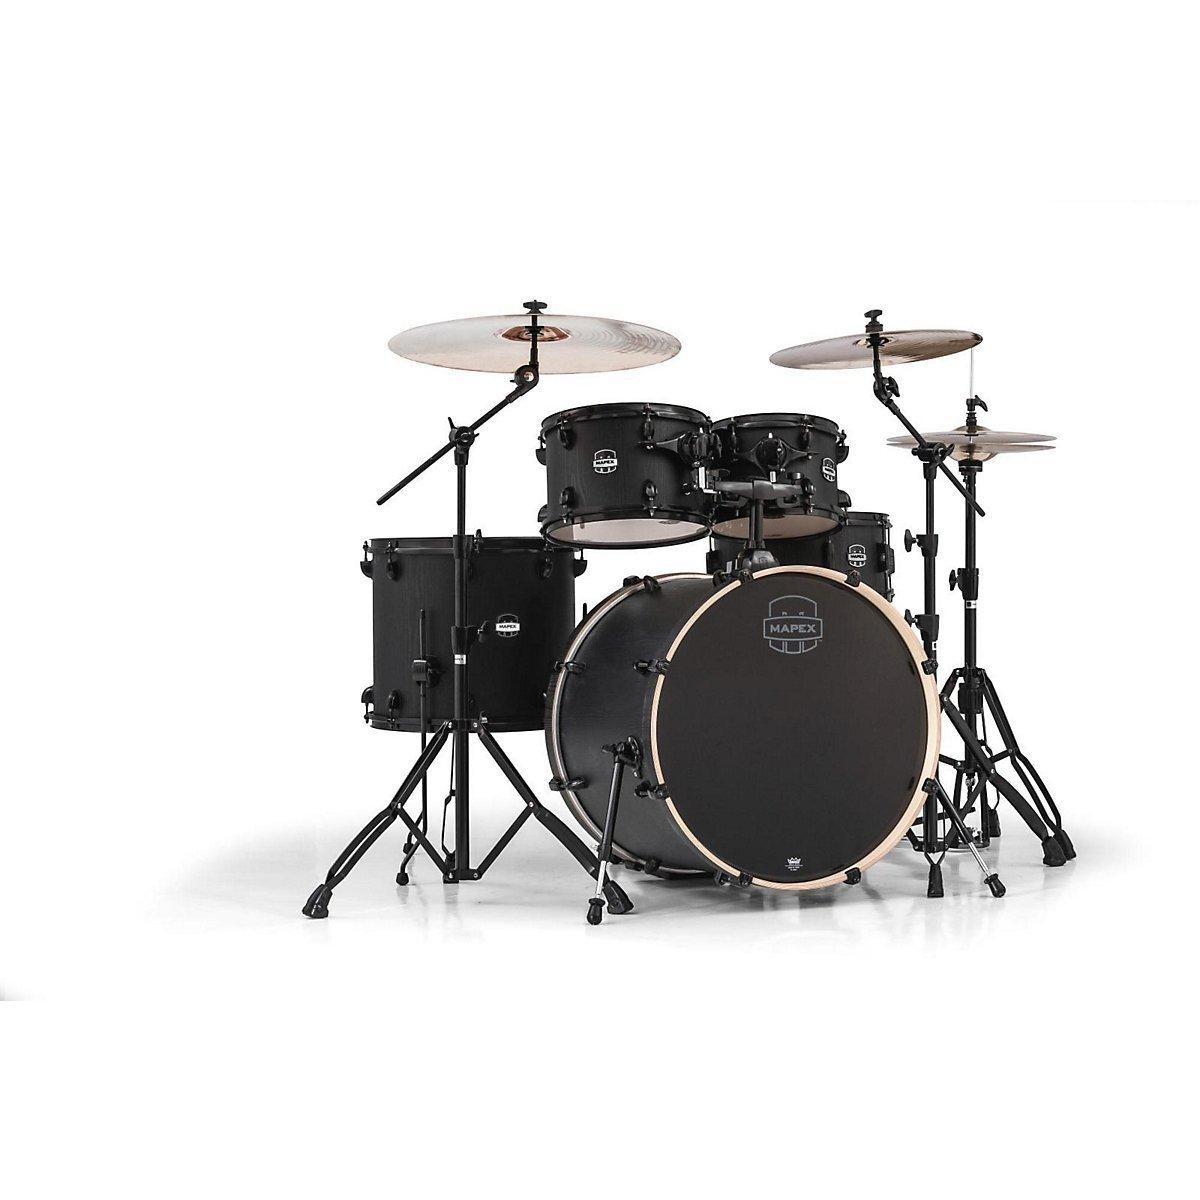 MAPEX MA529SFBZW Mars Series 5 Piece Rock Drum Shell Pack, Zebrawood